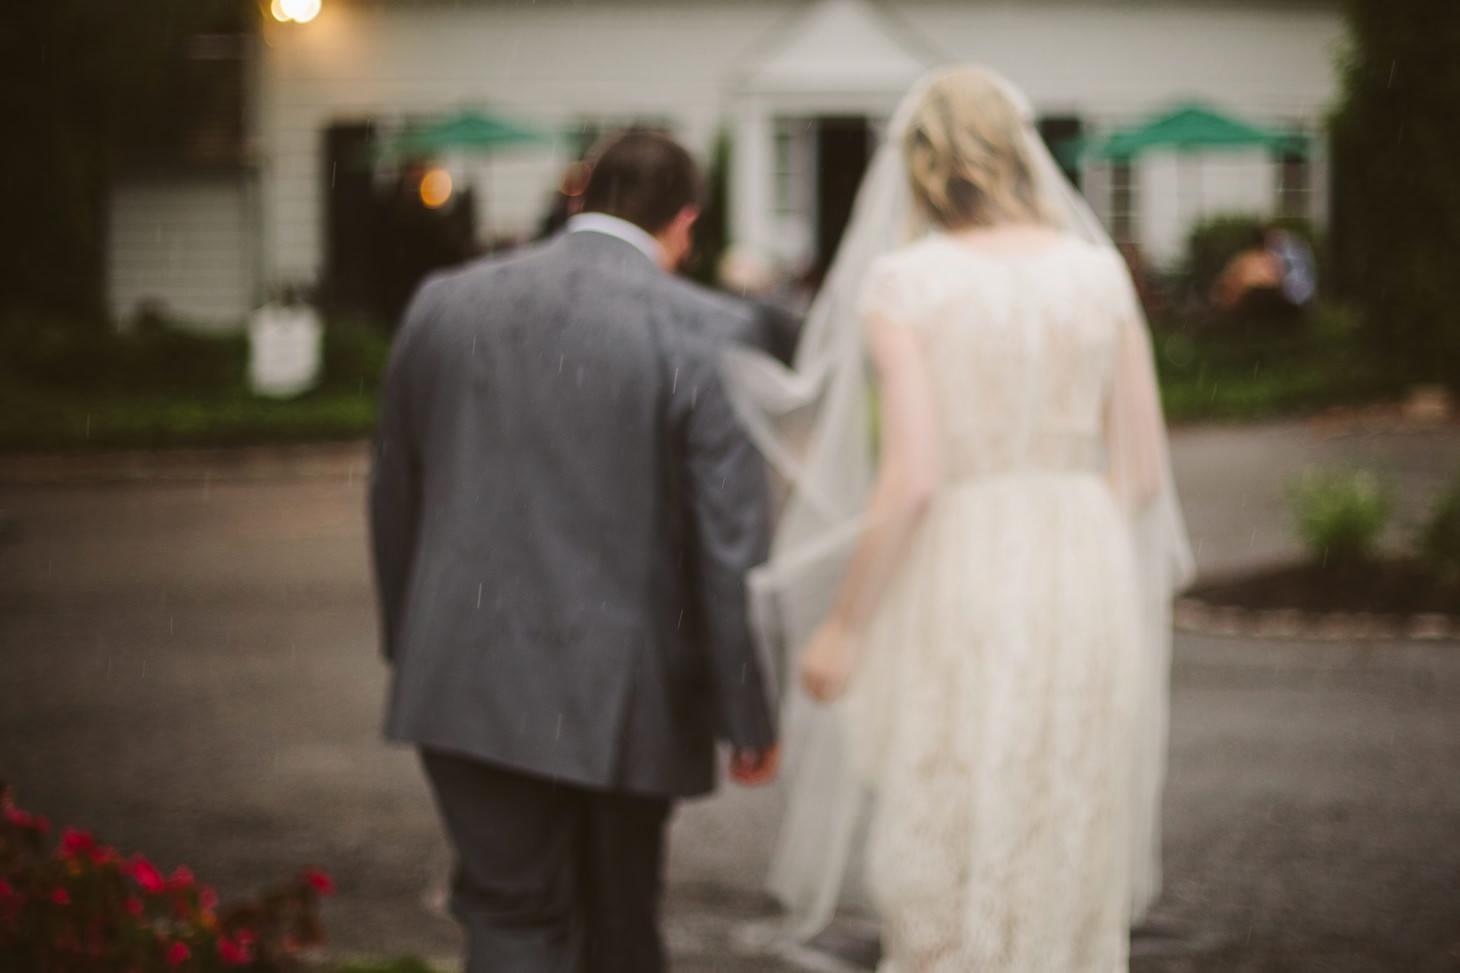 nyc-wedding-photographer-brooklyn-bridge-smitten-chickens-rainy-emotional-wedding-006.jpg